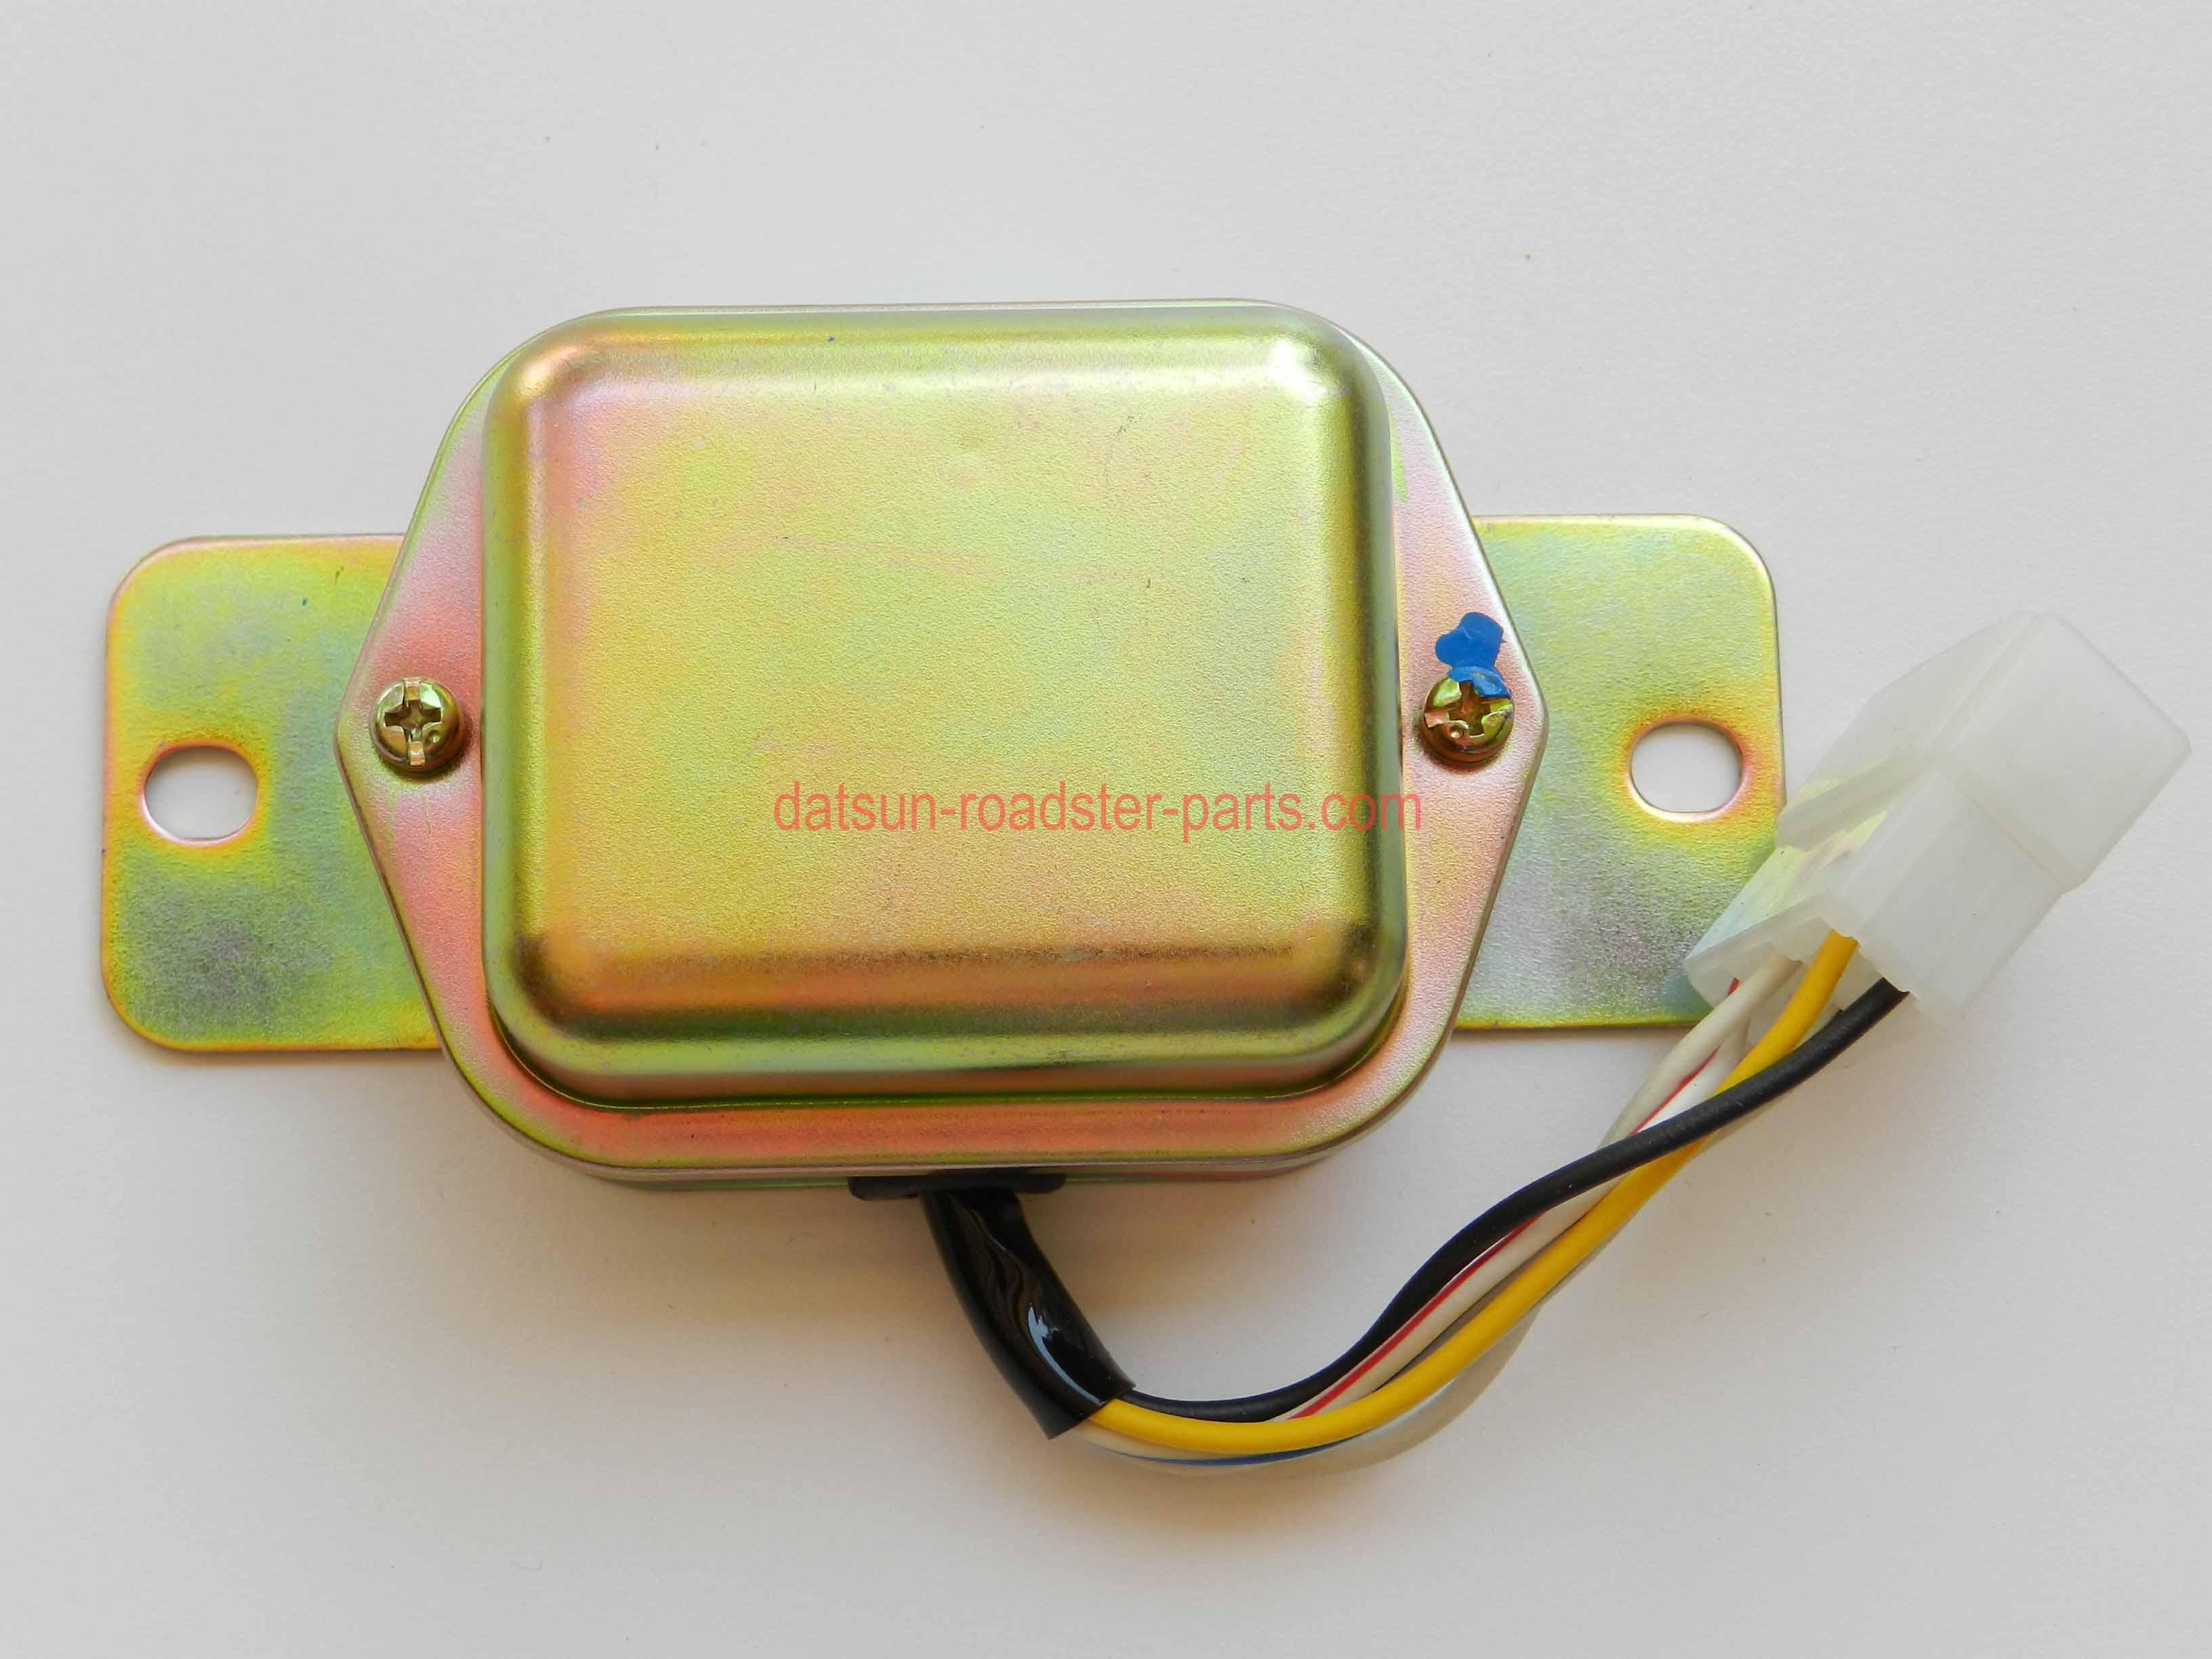 LE 153 Datsun Roadster Wiring Harness on